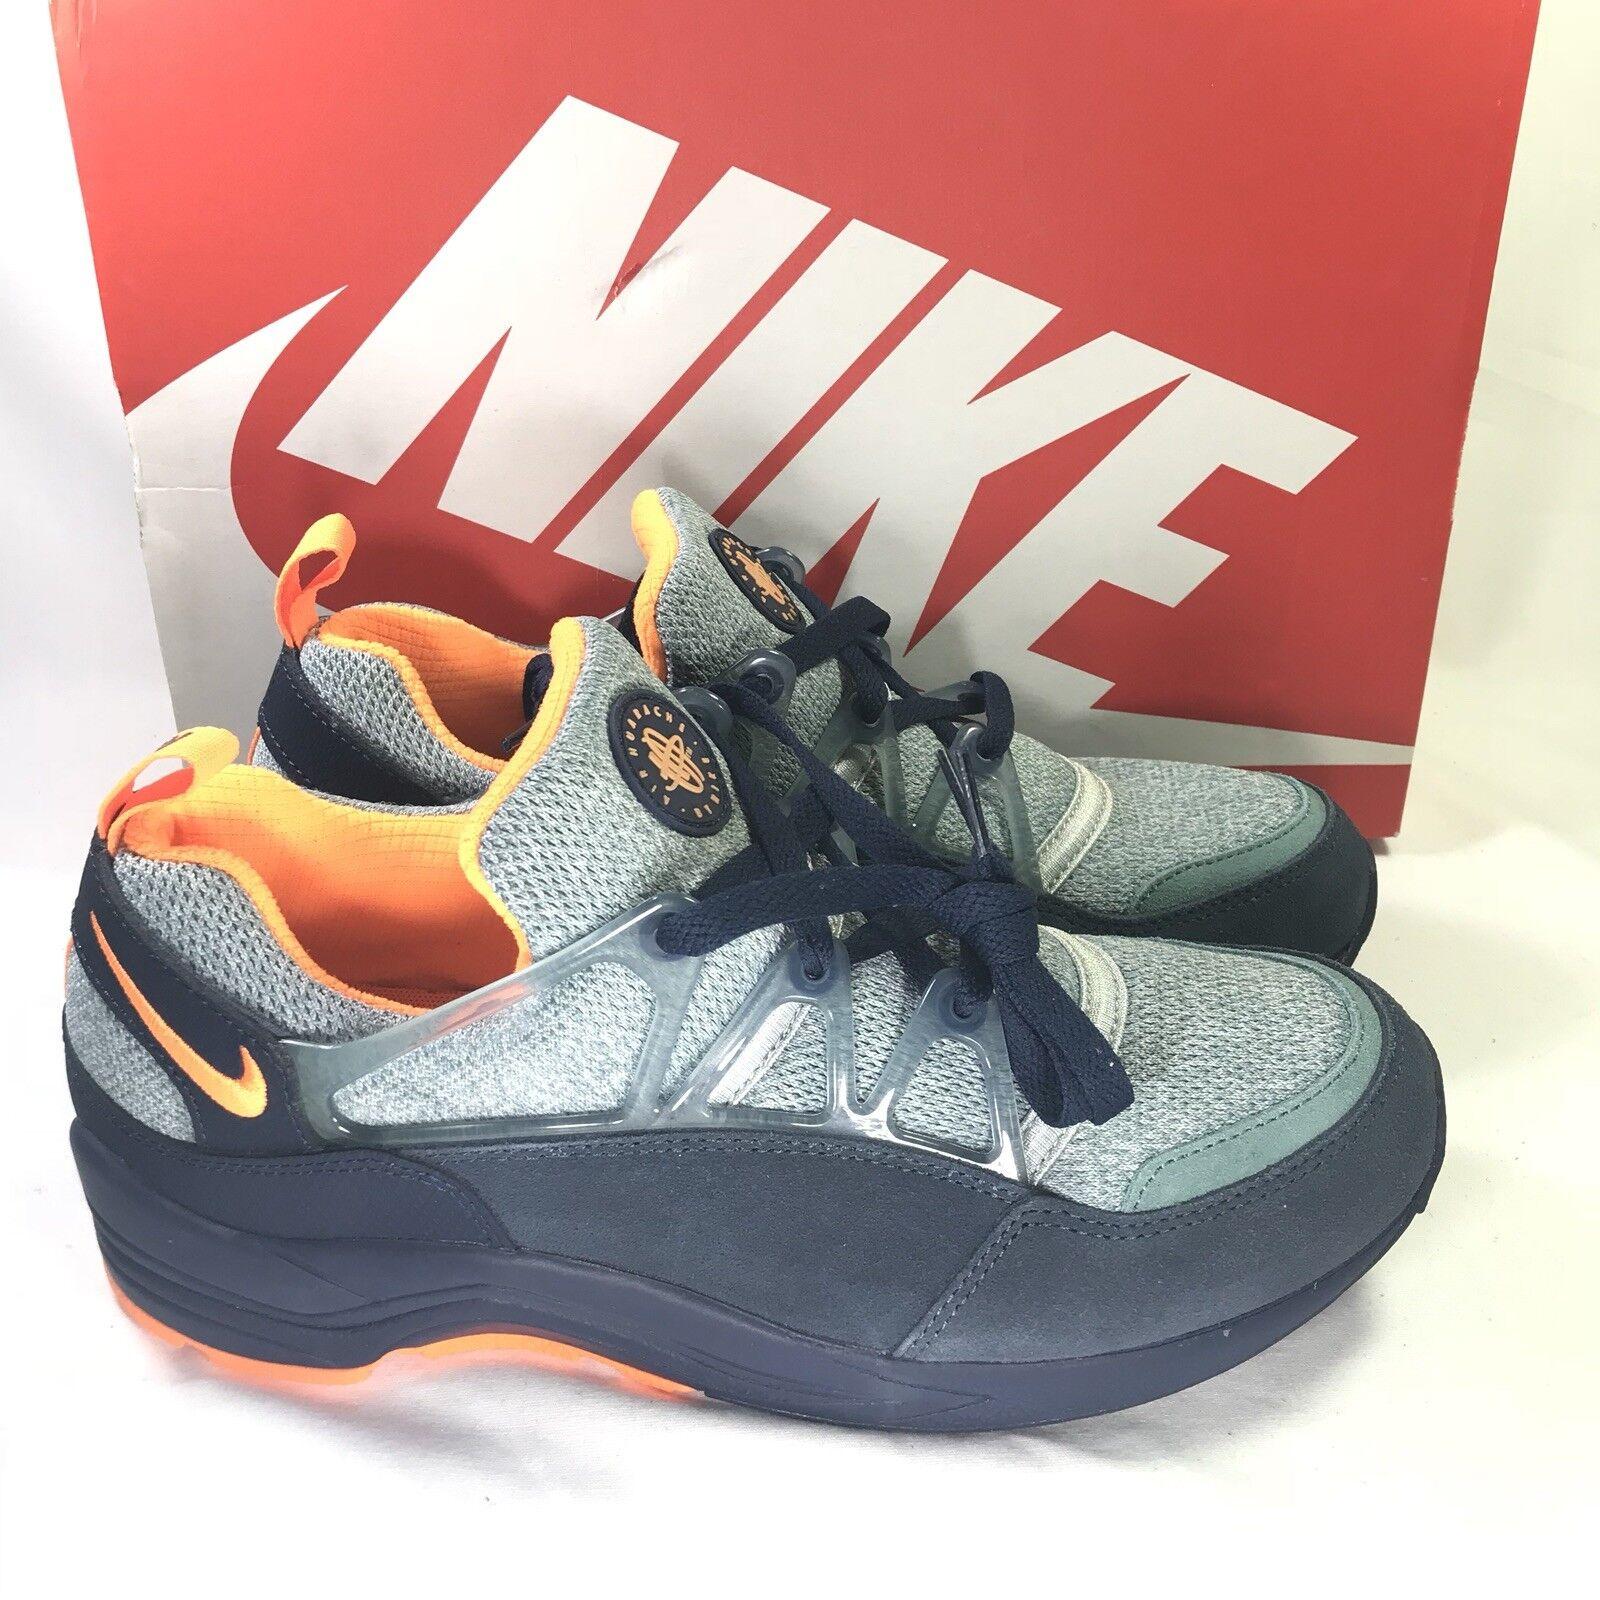 e505ba624053 Nike Zoom Air Huarache Men s Men s Men s Size 8 bluee Citrus 306127-402  6adfa3